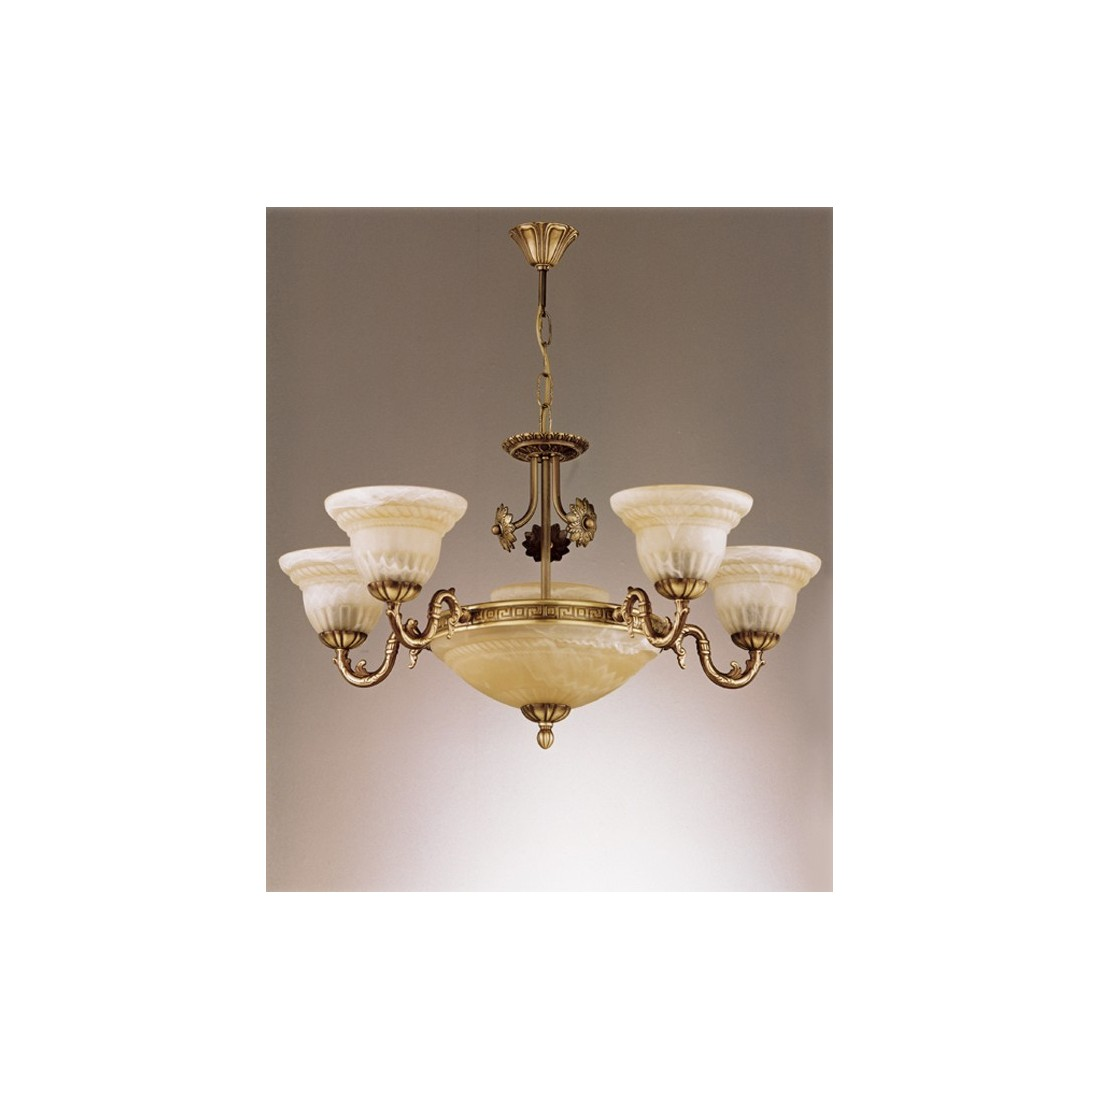 Dos luces aplique de pared de bronce distribuidores oficiales - Apliques de bronce para muebles ...